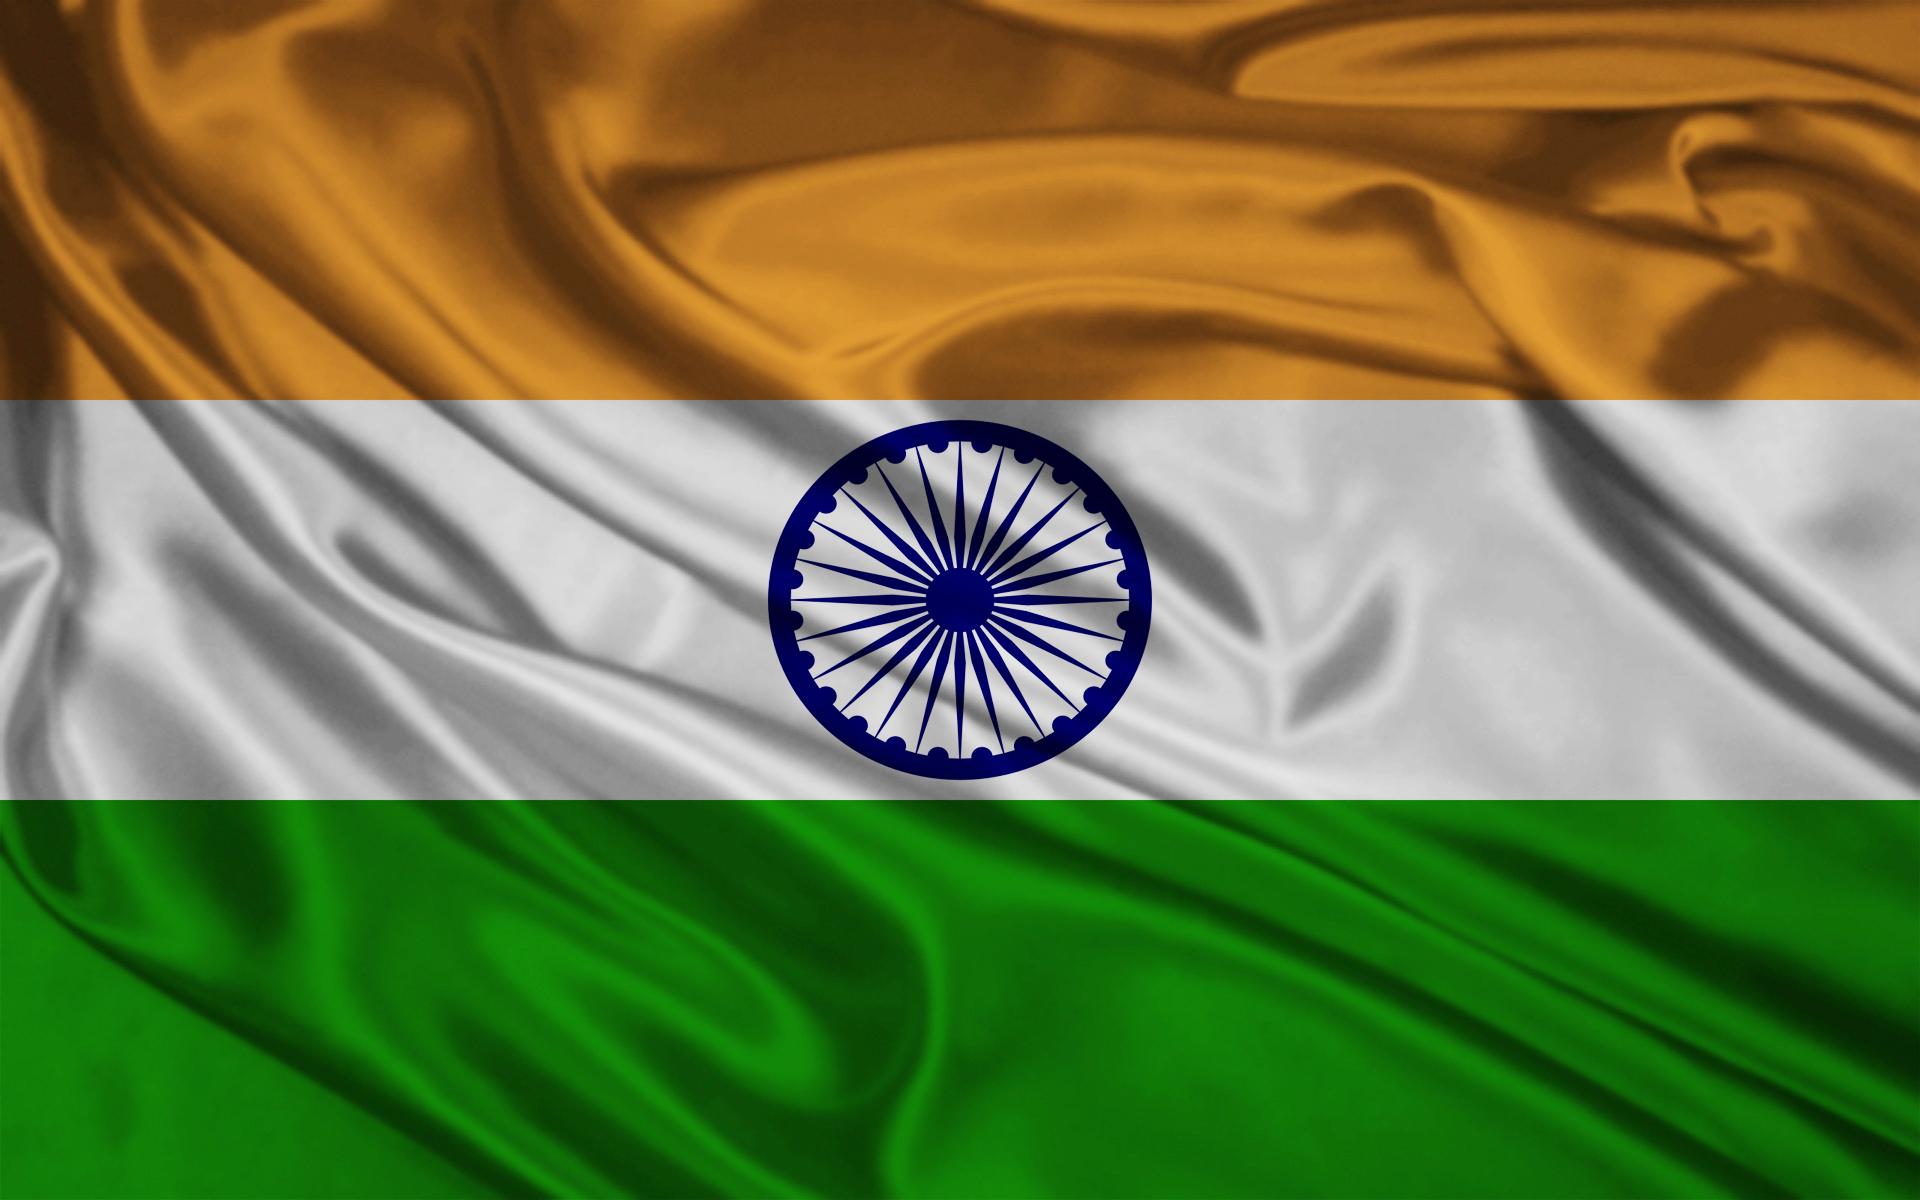 INDIA CRYPTO BAN WILL COST $13 BILLION